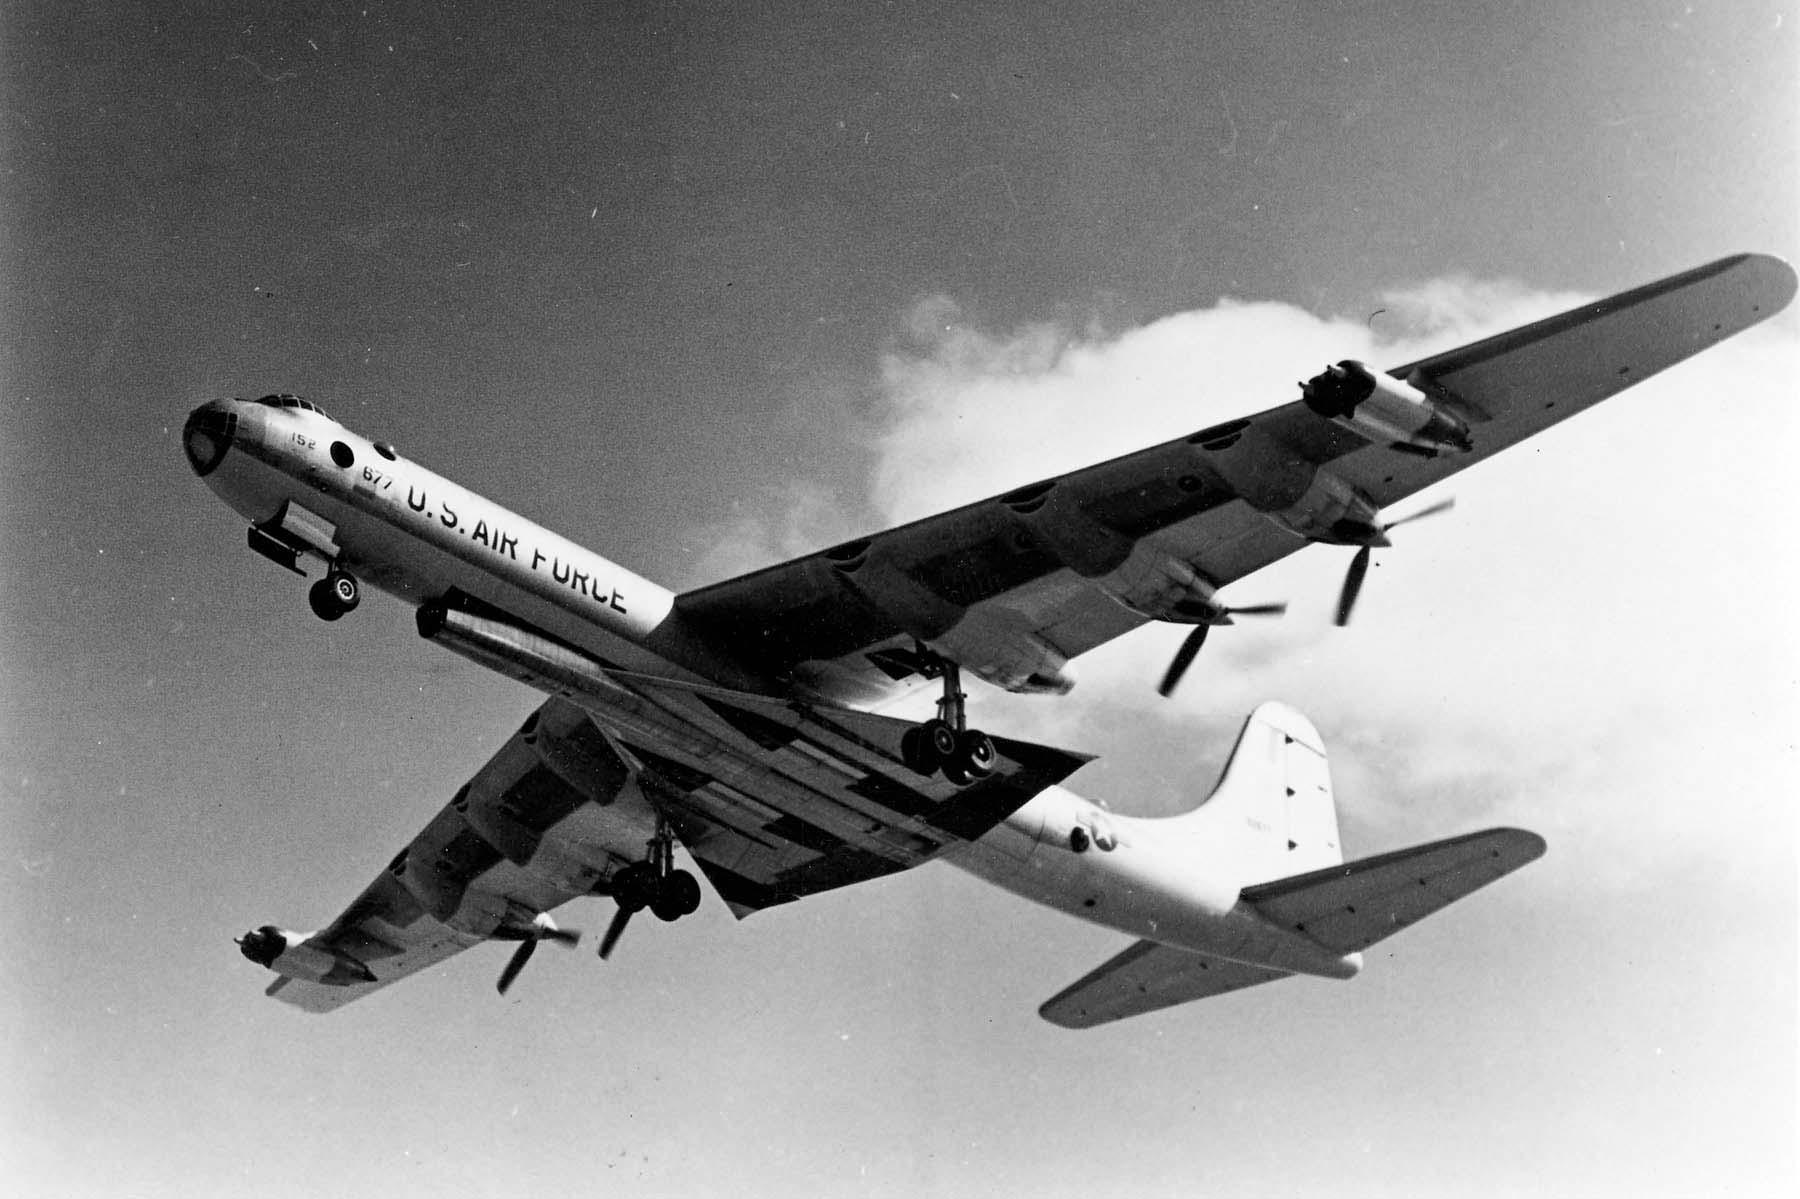 Convair B-36 Peacemaker Photo Gallery